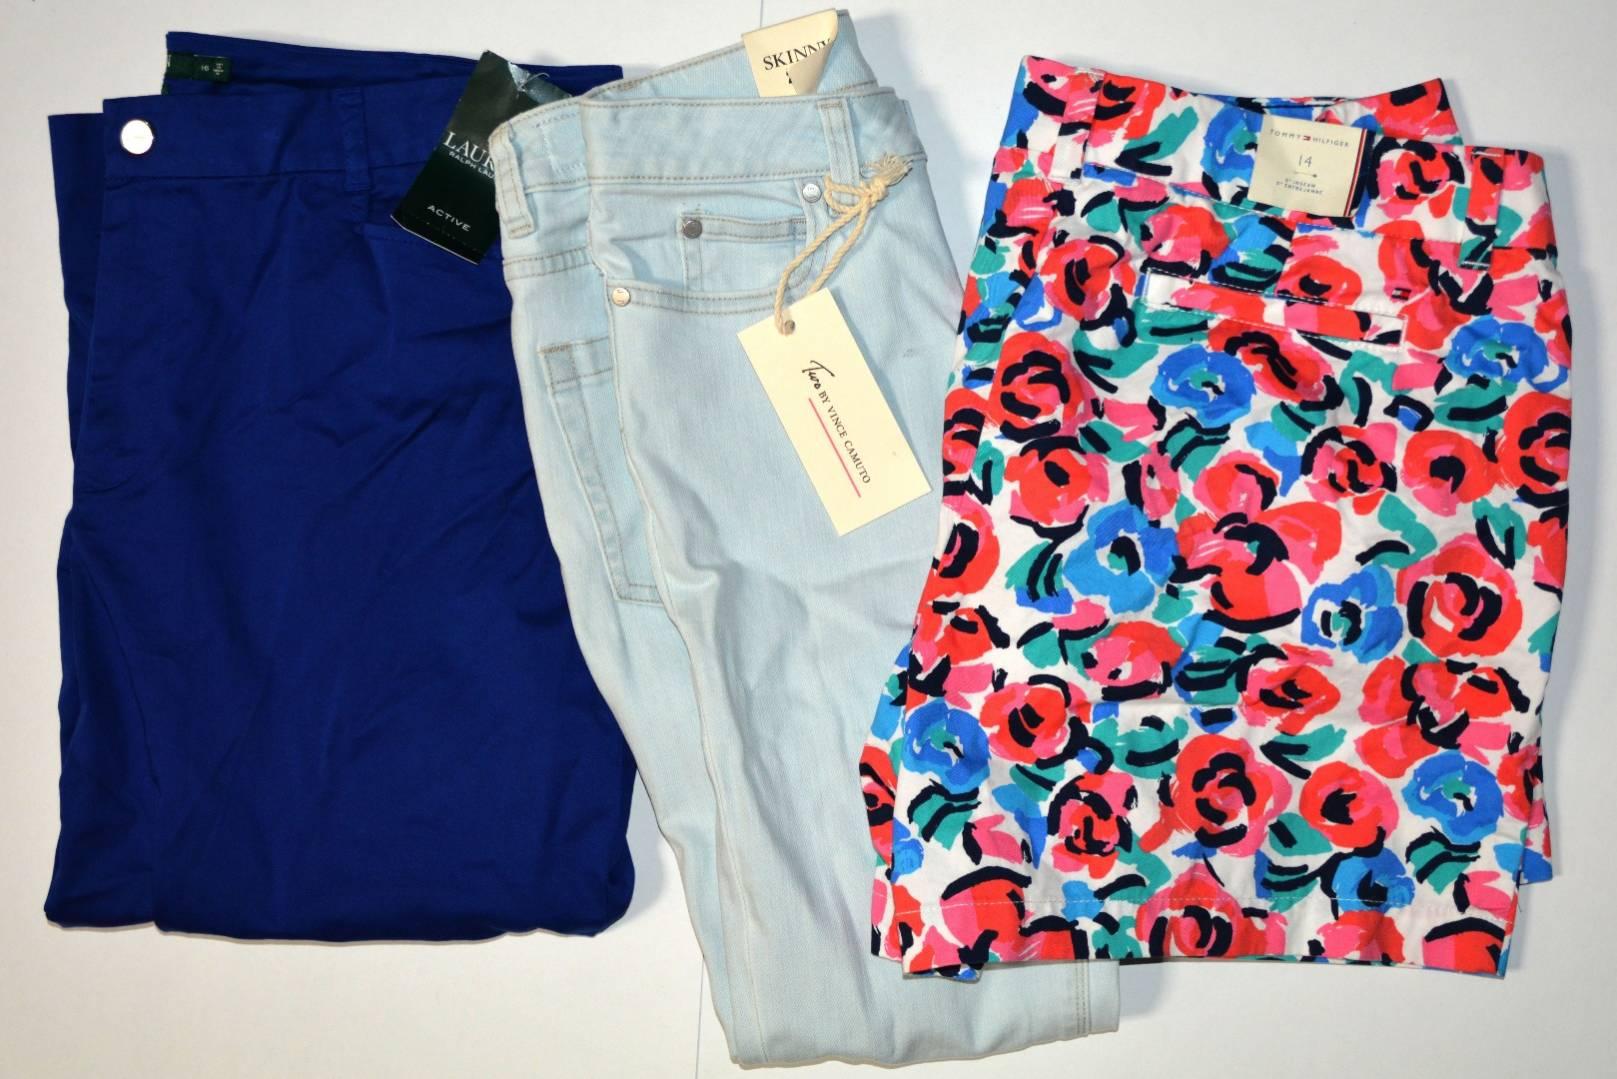 Designer Wholesale Clothing Suppliers | Via Trading Wholesale Name Brand Clothing Wholesale Designer